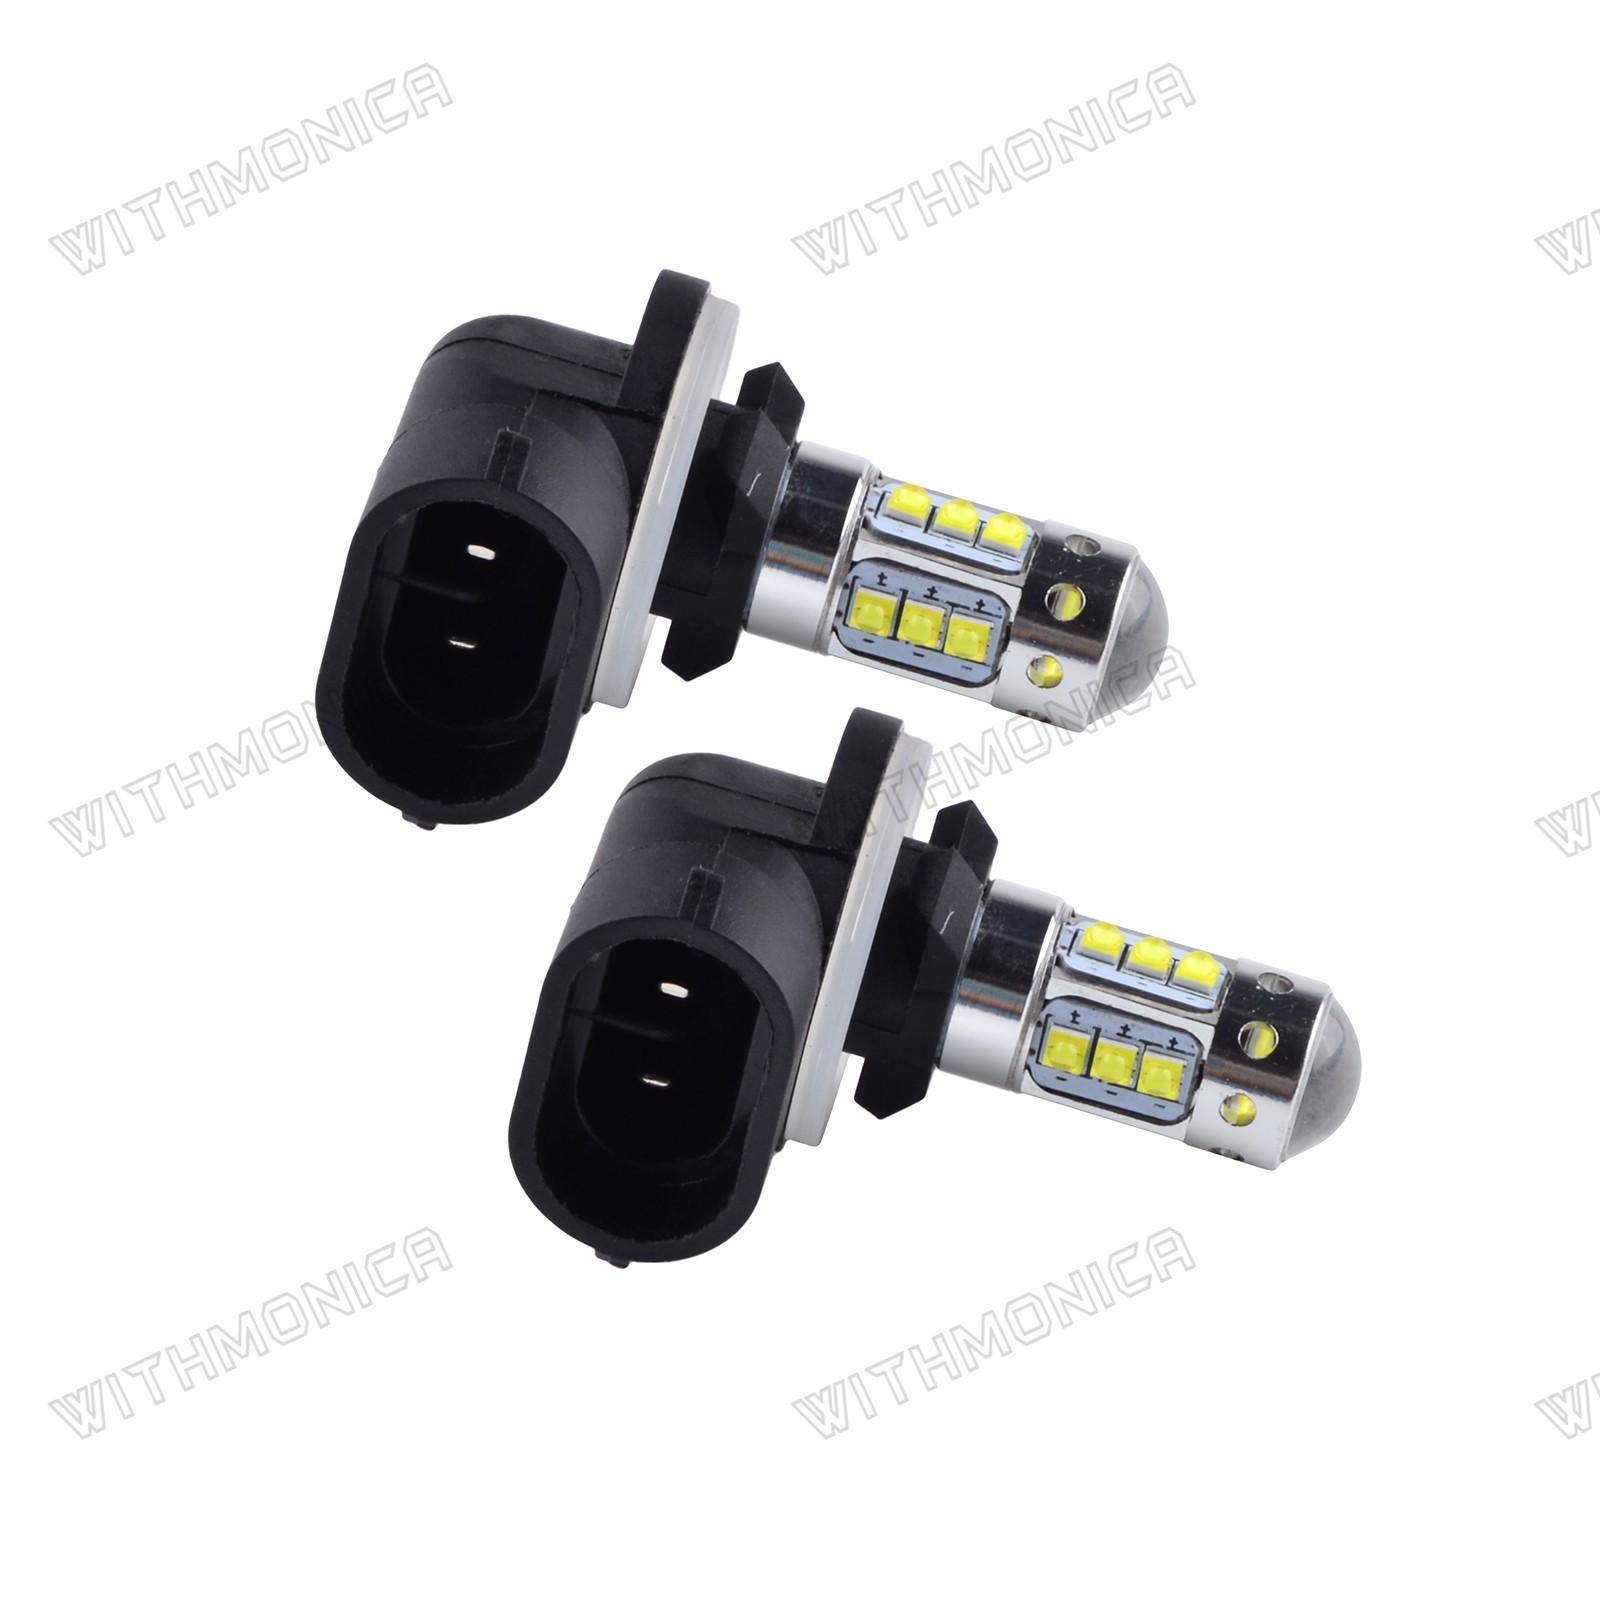 881 LED Headlight Bulbs For Polaris Sportsman X2 500 550 700 800 80W 15000LM